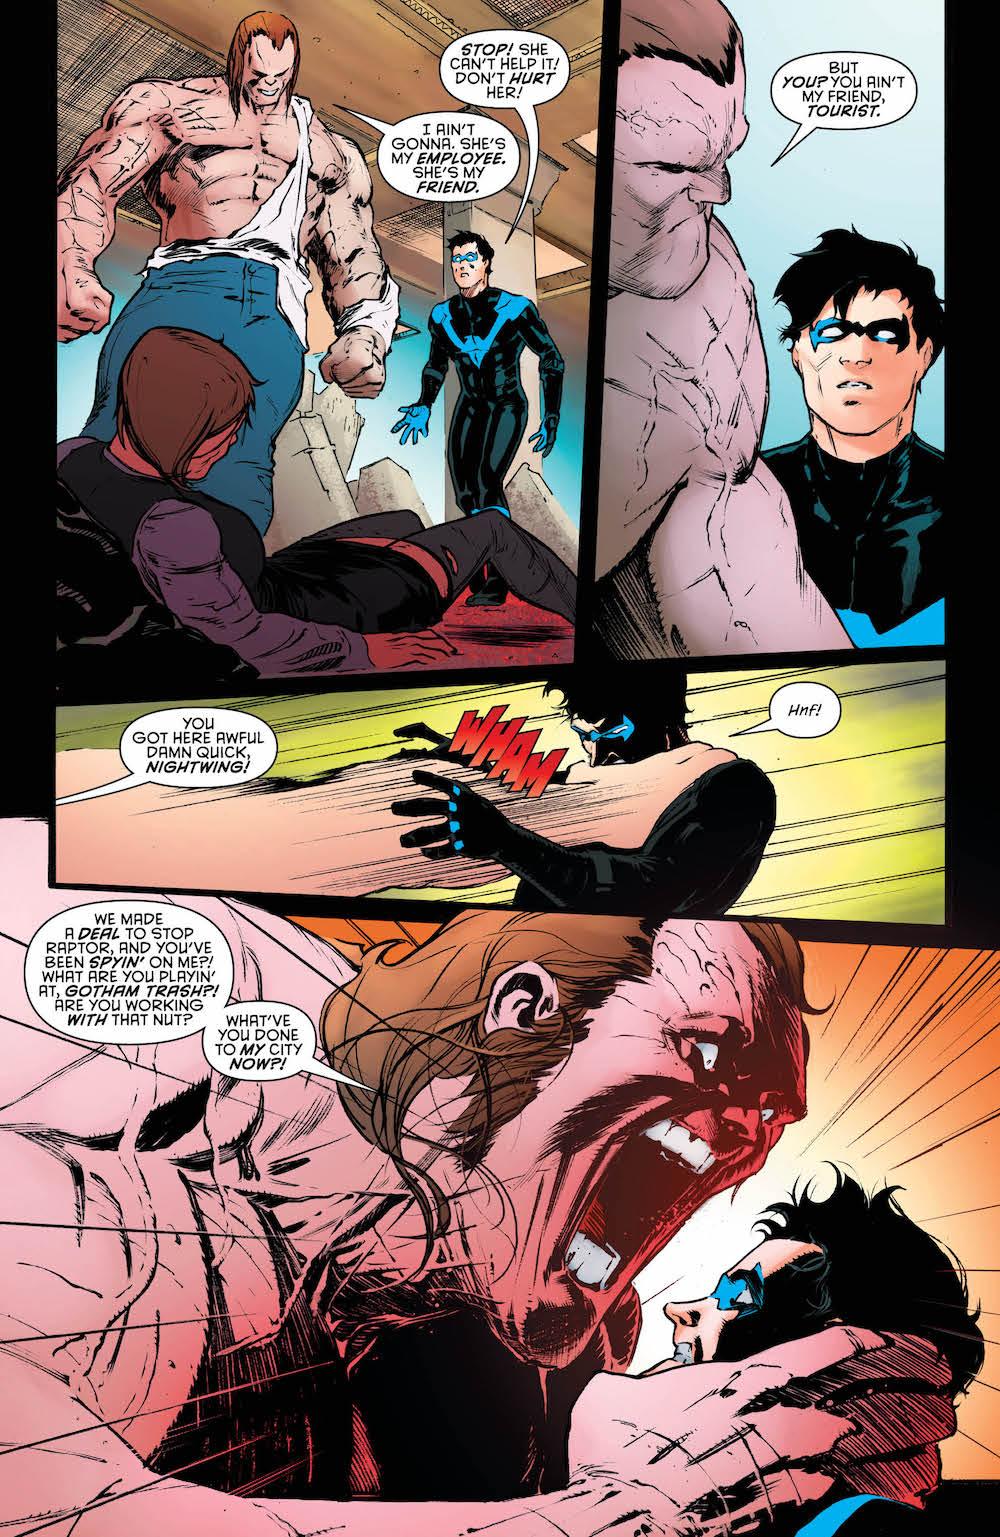 Nightwing #33, 2017